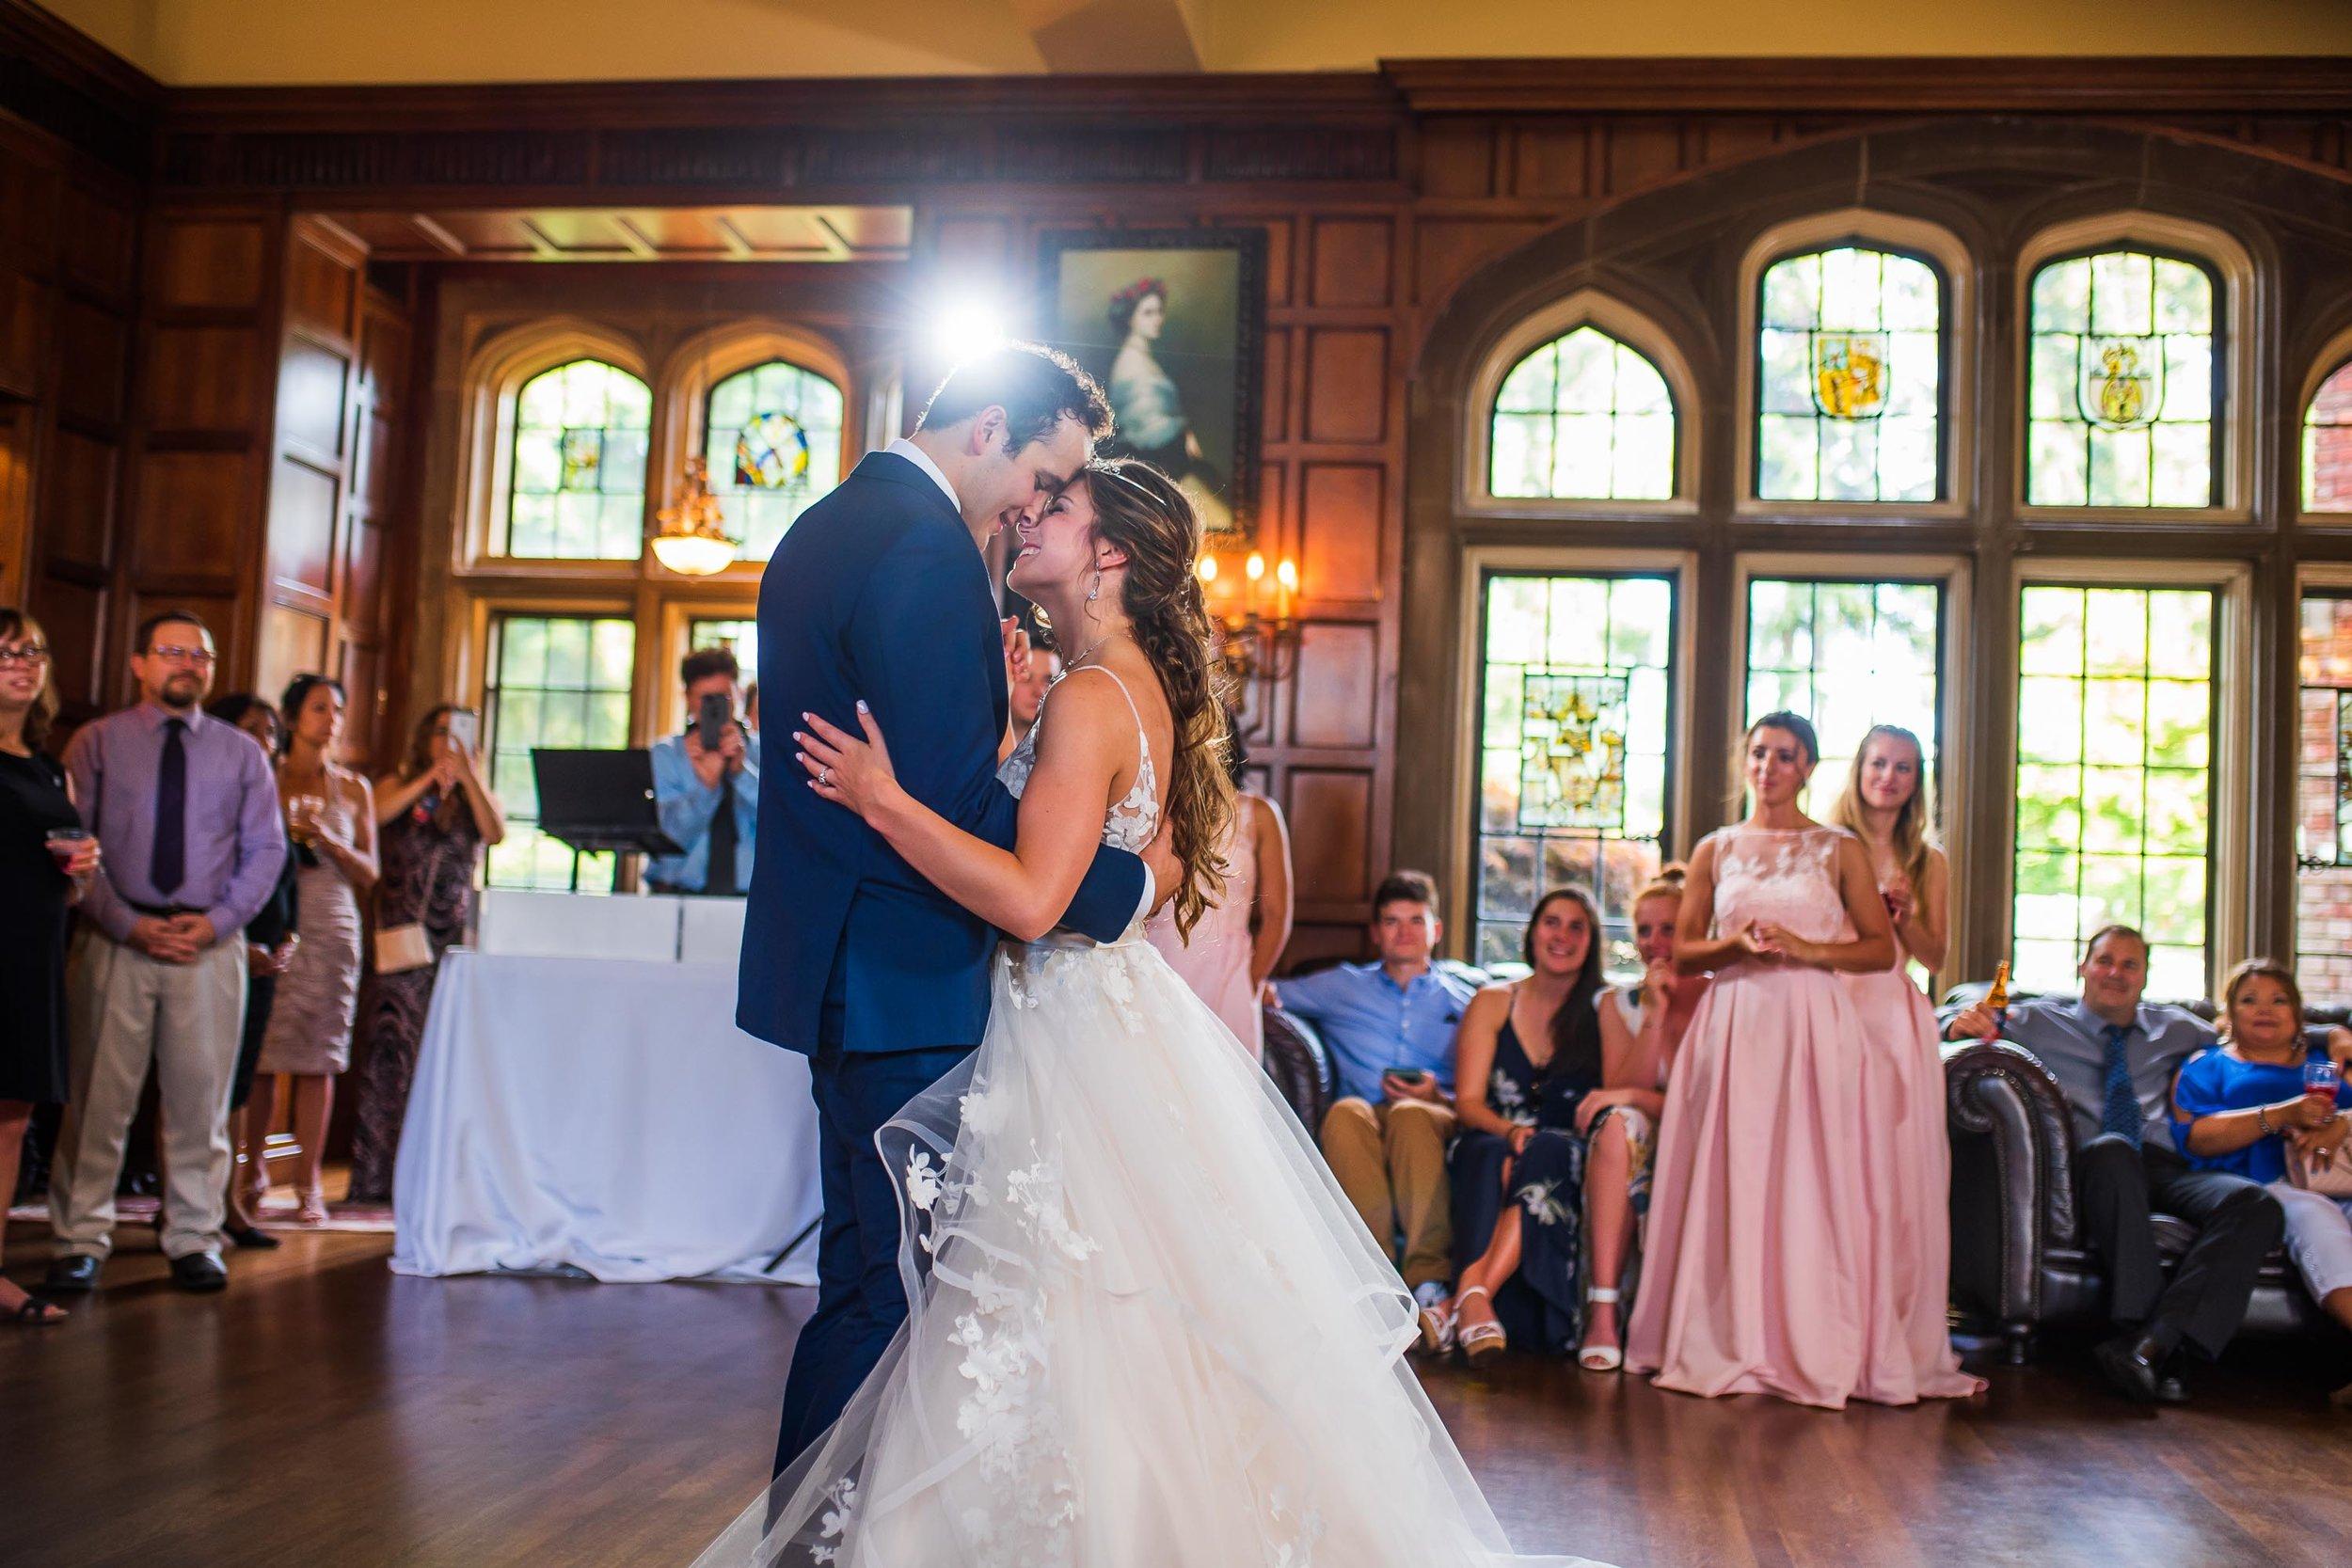 thornewood castle wedding 67.jpg